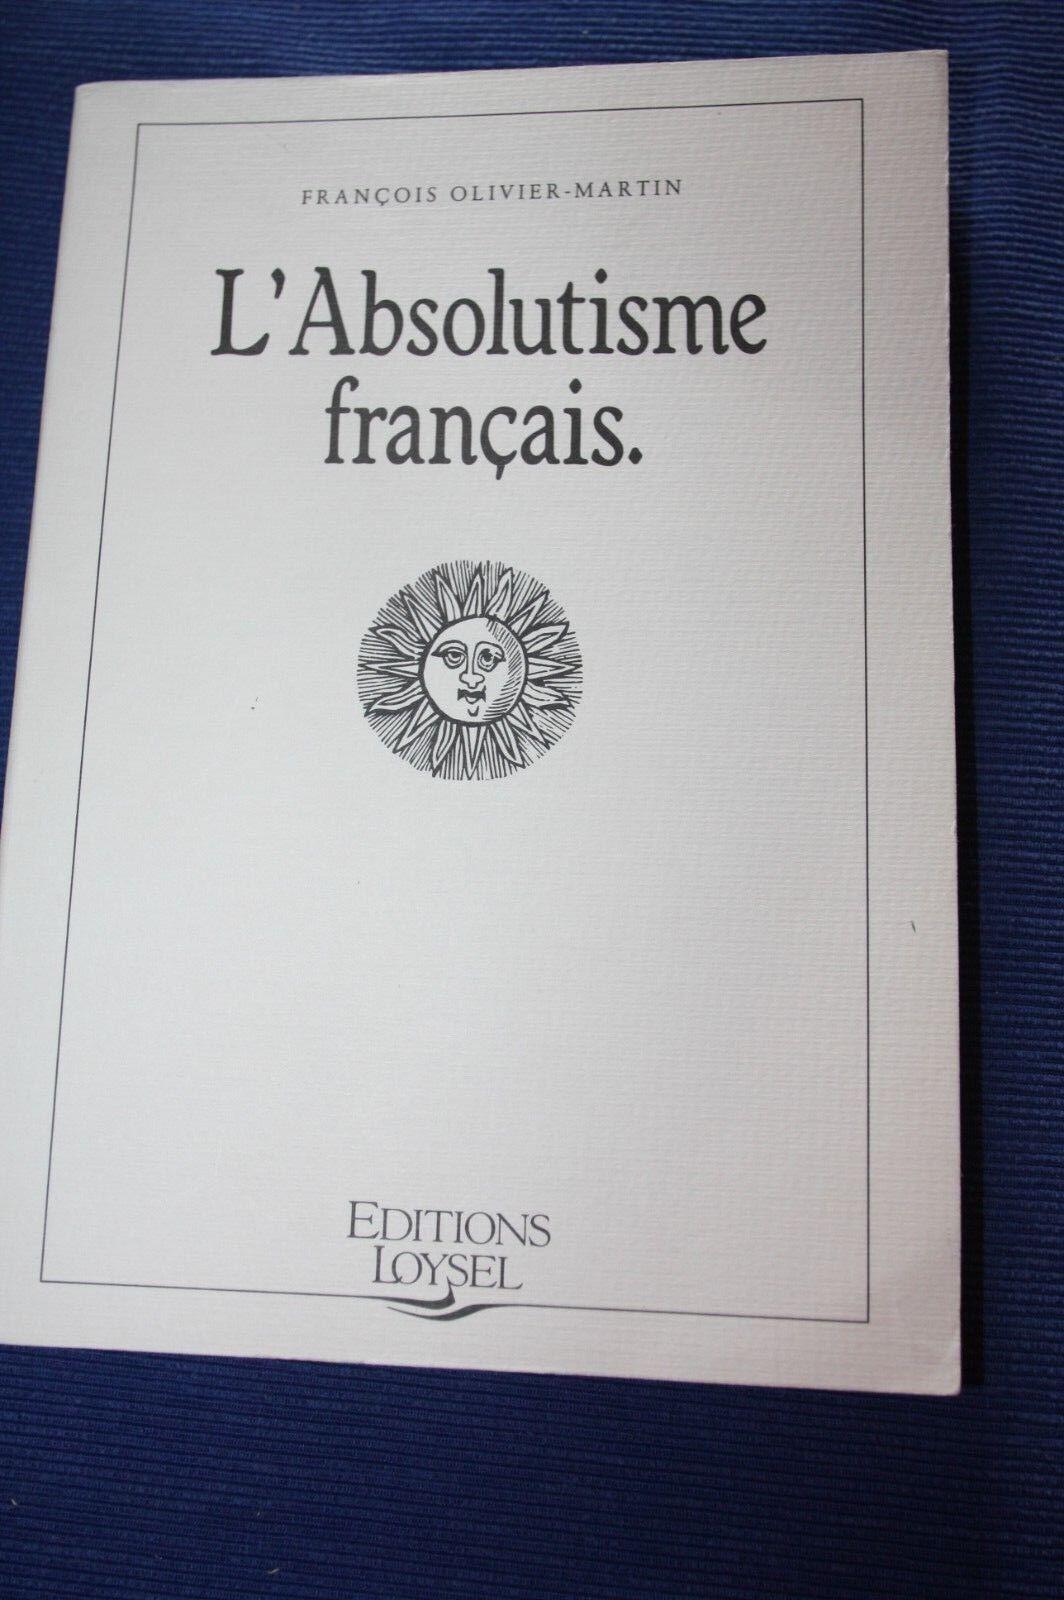 OLIVIER-MARTIN / L'absolutisme français